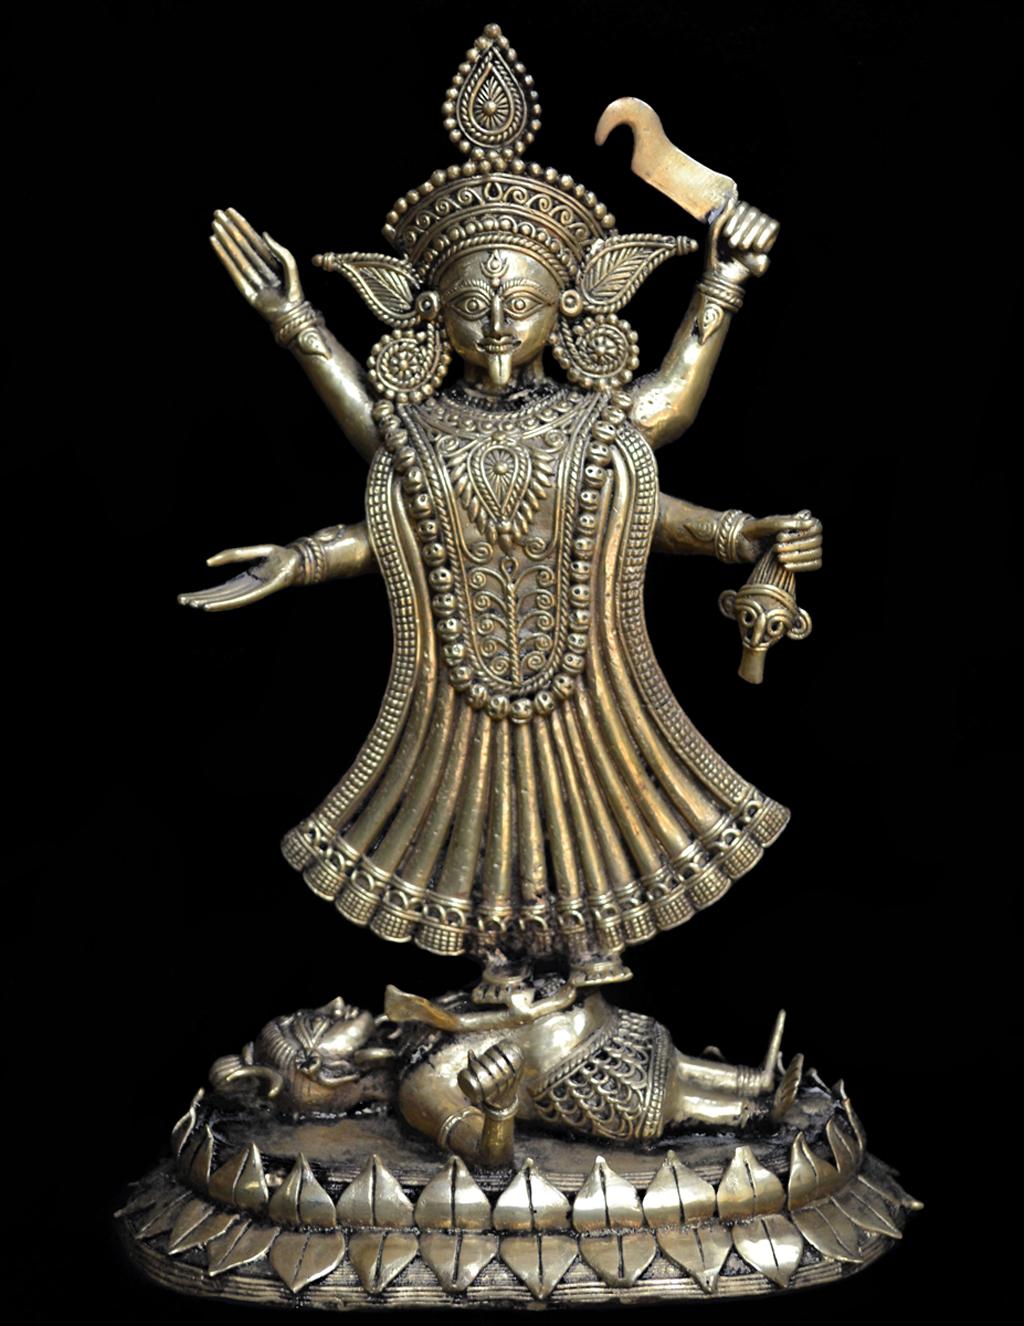 Dhokra figurine of the goddess Kali